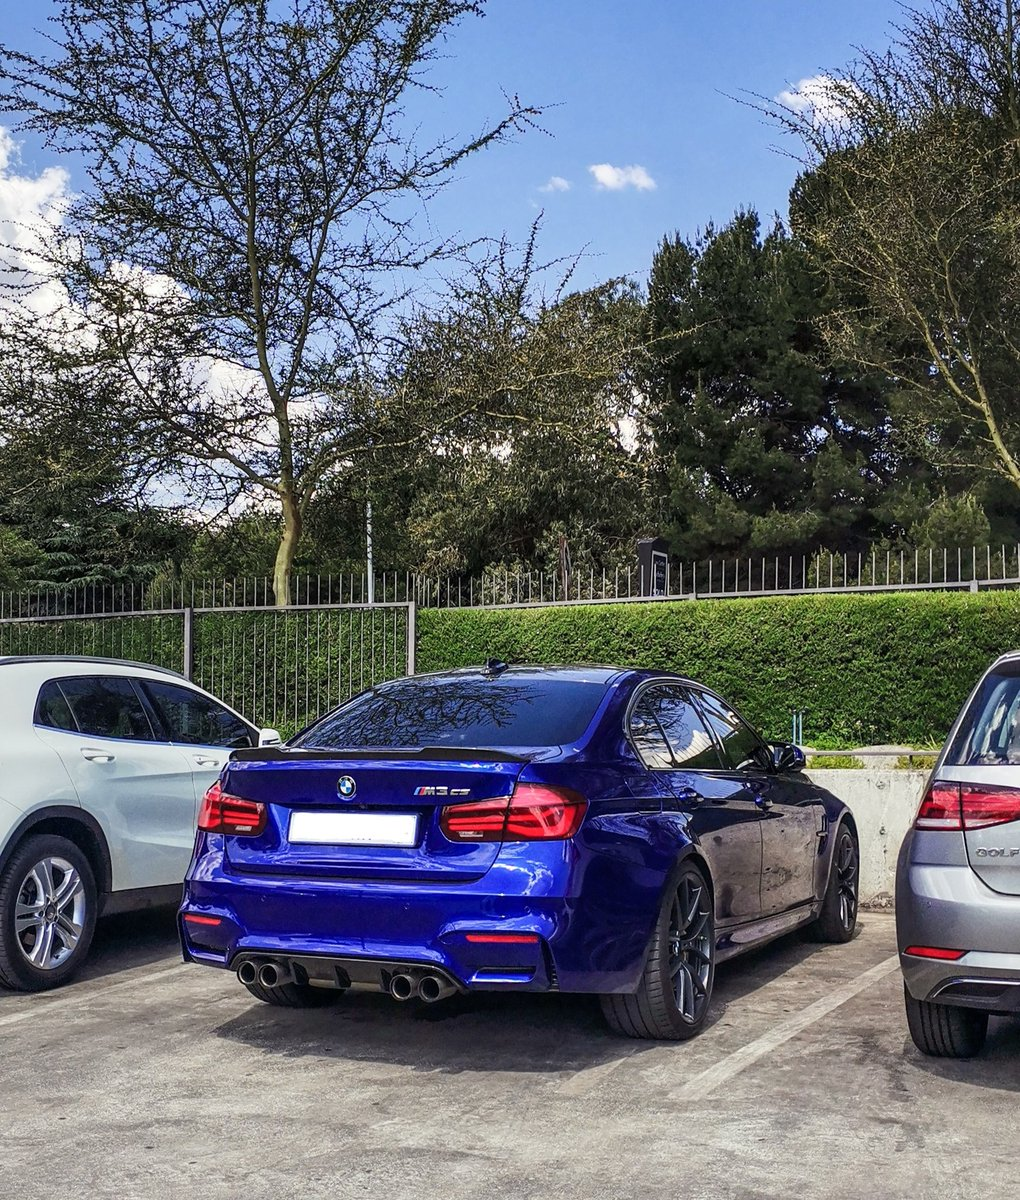 San Marino Blue BMW M3 CS! 🔵  #BMW #M3 #CS #M3CS #Blue #SanMarino #Mpower #Germany #German #JHB #Johannesburg #SA #SouthAfrica #LifeAboutCars https://t.co/CGYymnP0wc